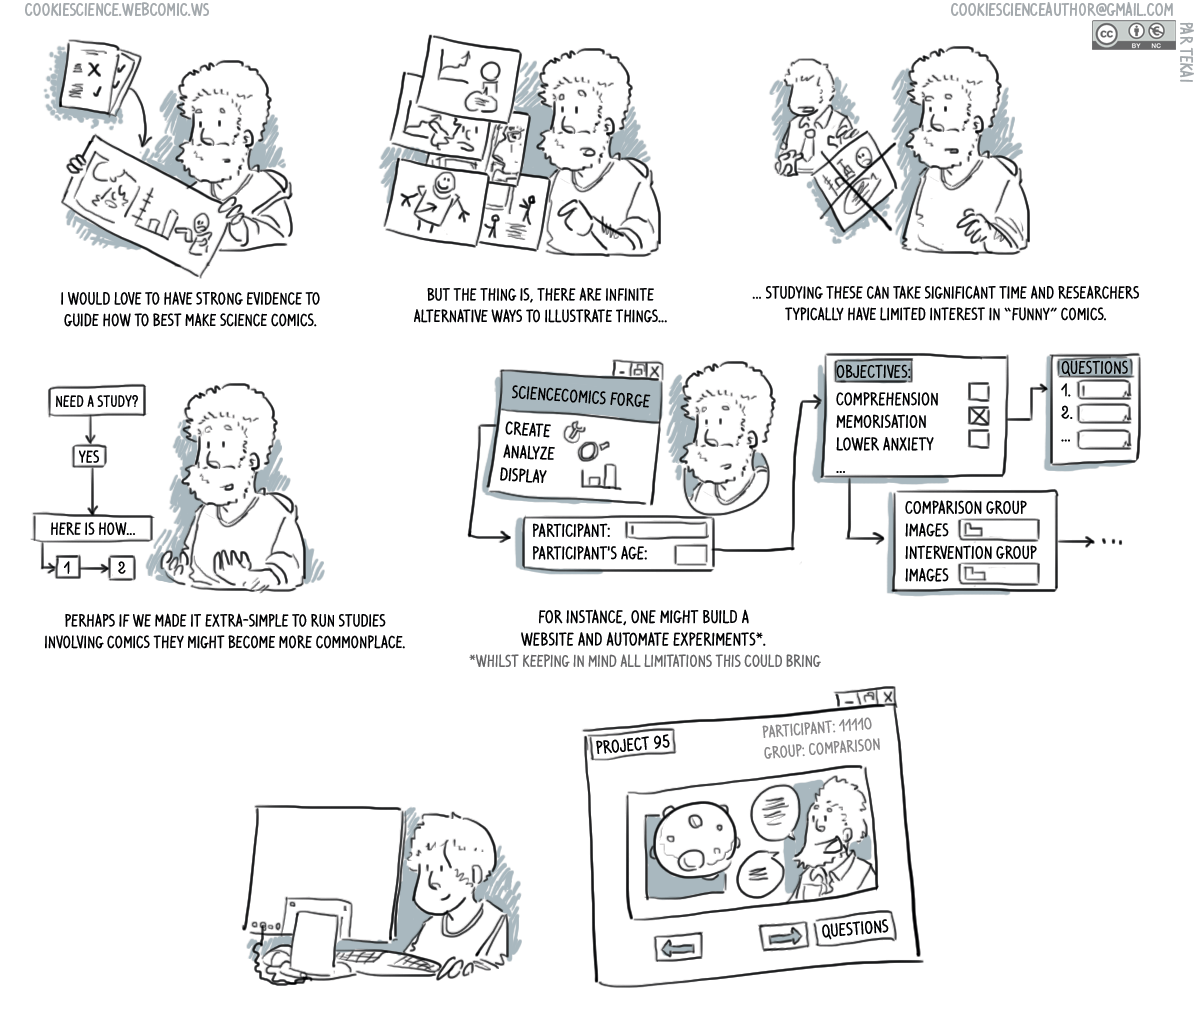 523 - Streamlining experimental research involving comics